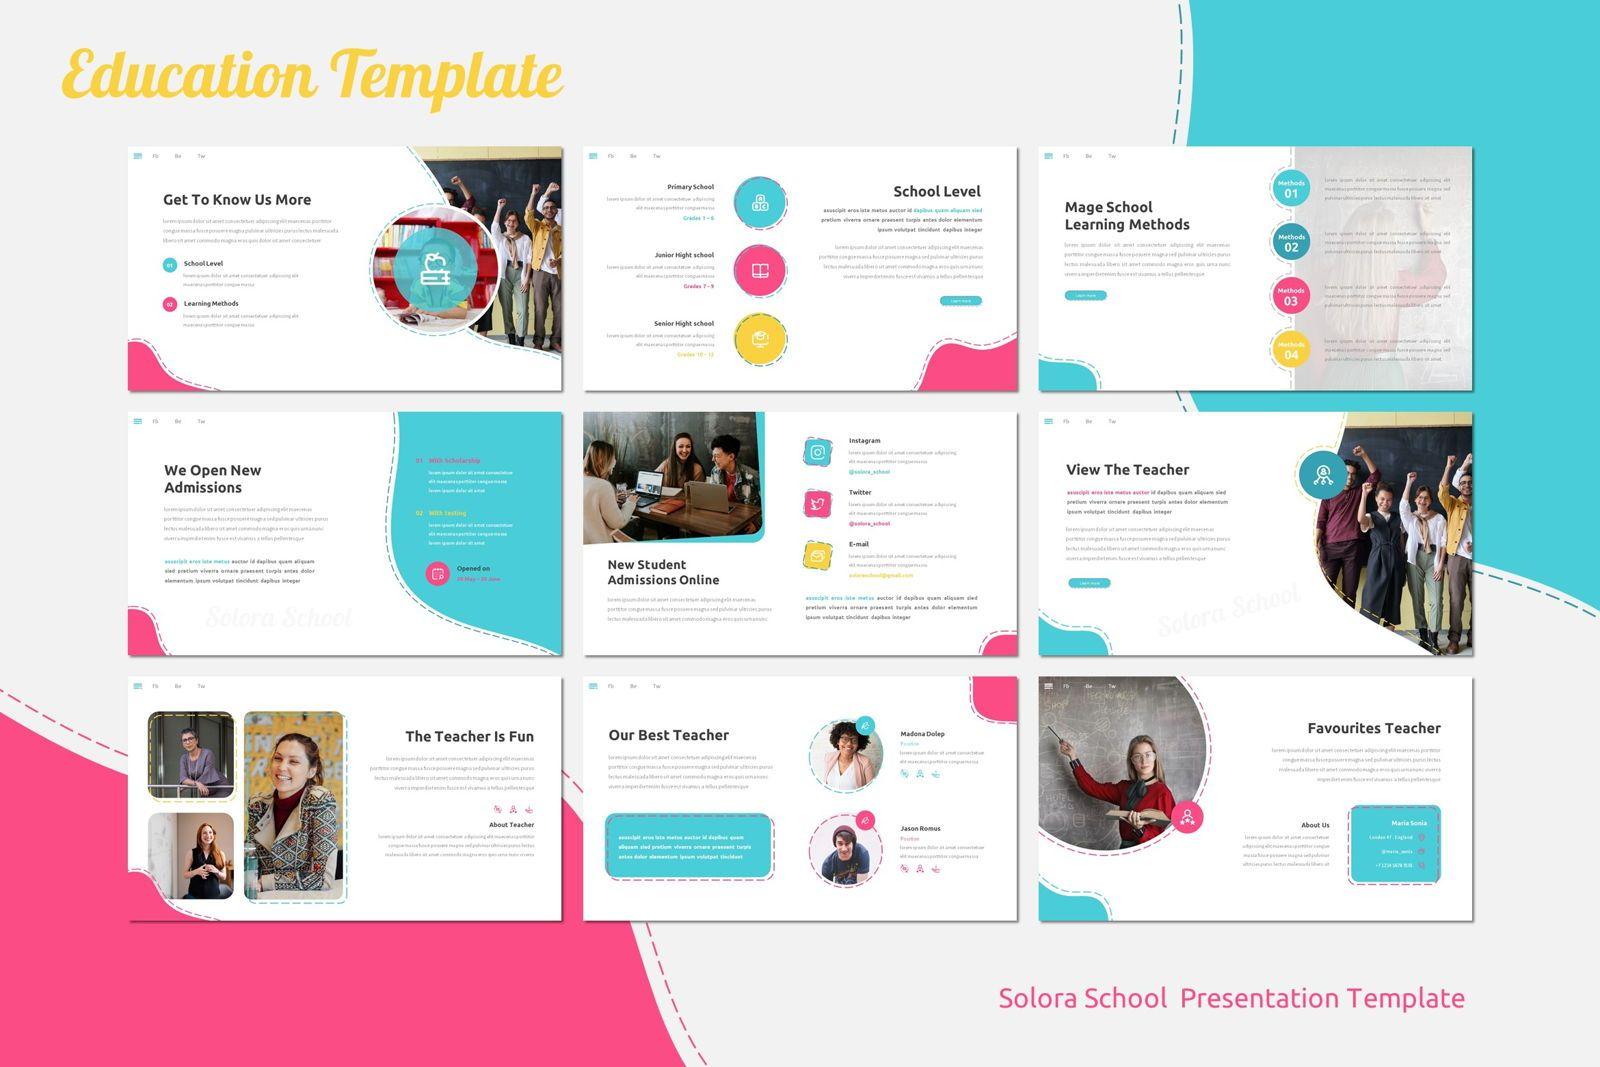 Solora School - Google Slides Template, Slide 3, 07767, Presentation Templates — PoweredTemplate.com